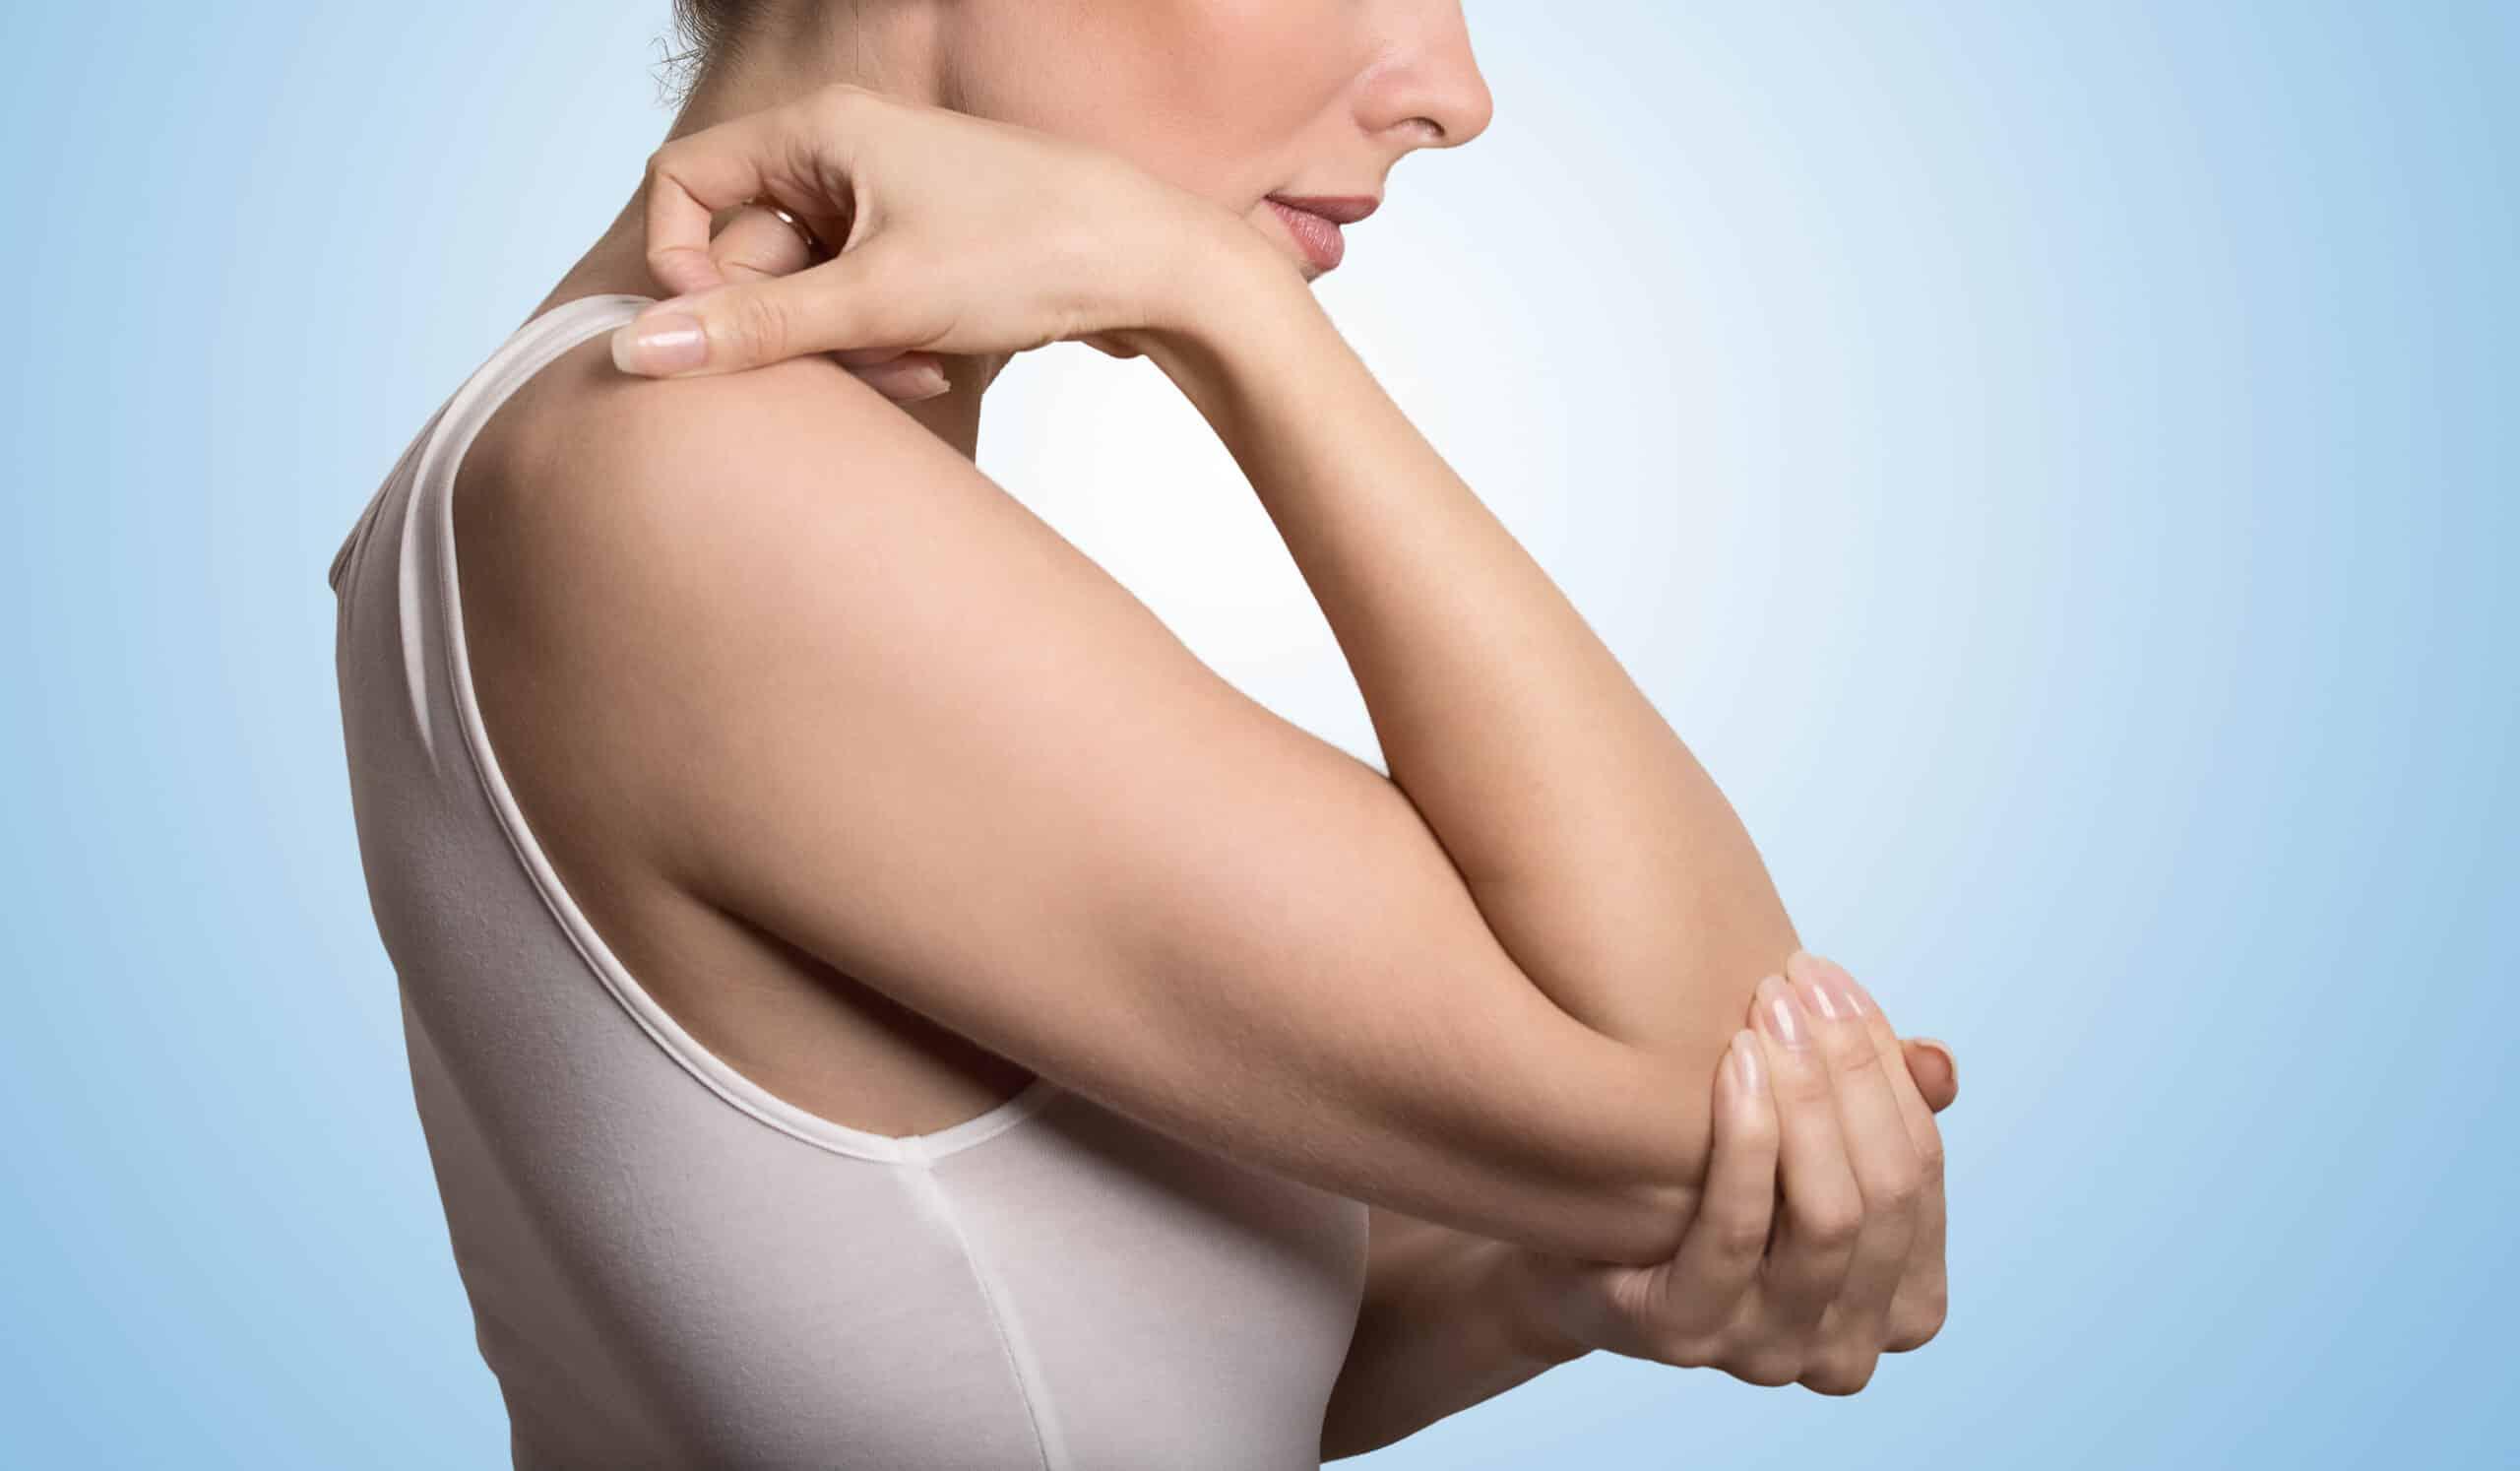 Autoimmune disorder treatment benefits